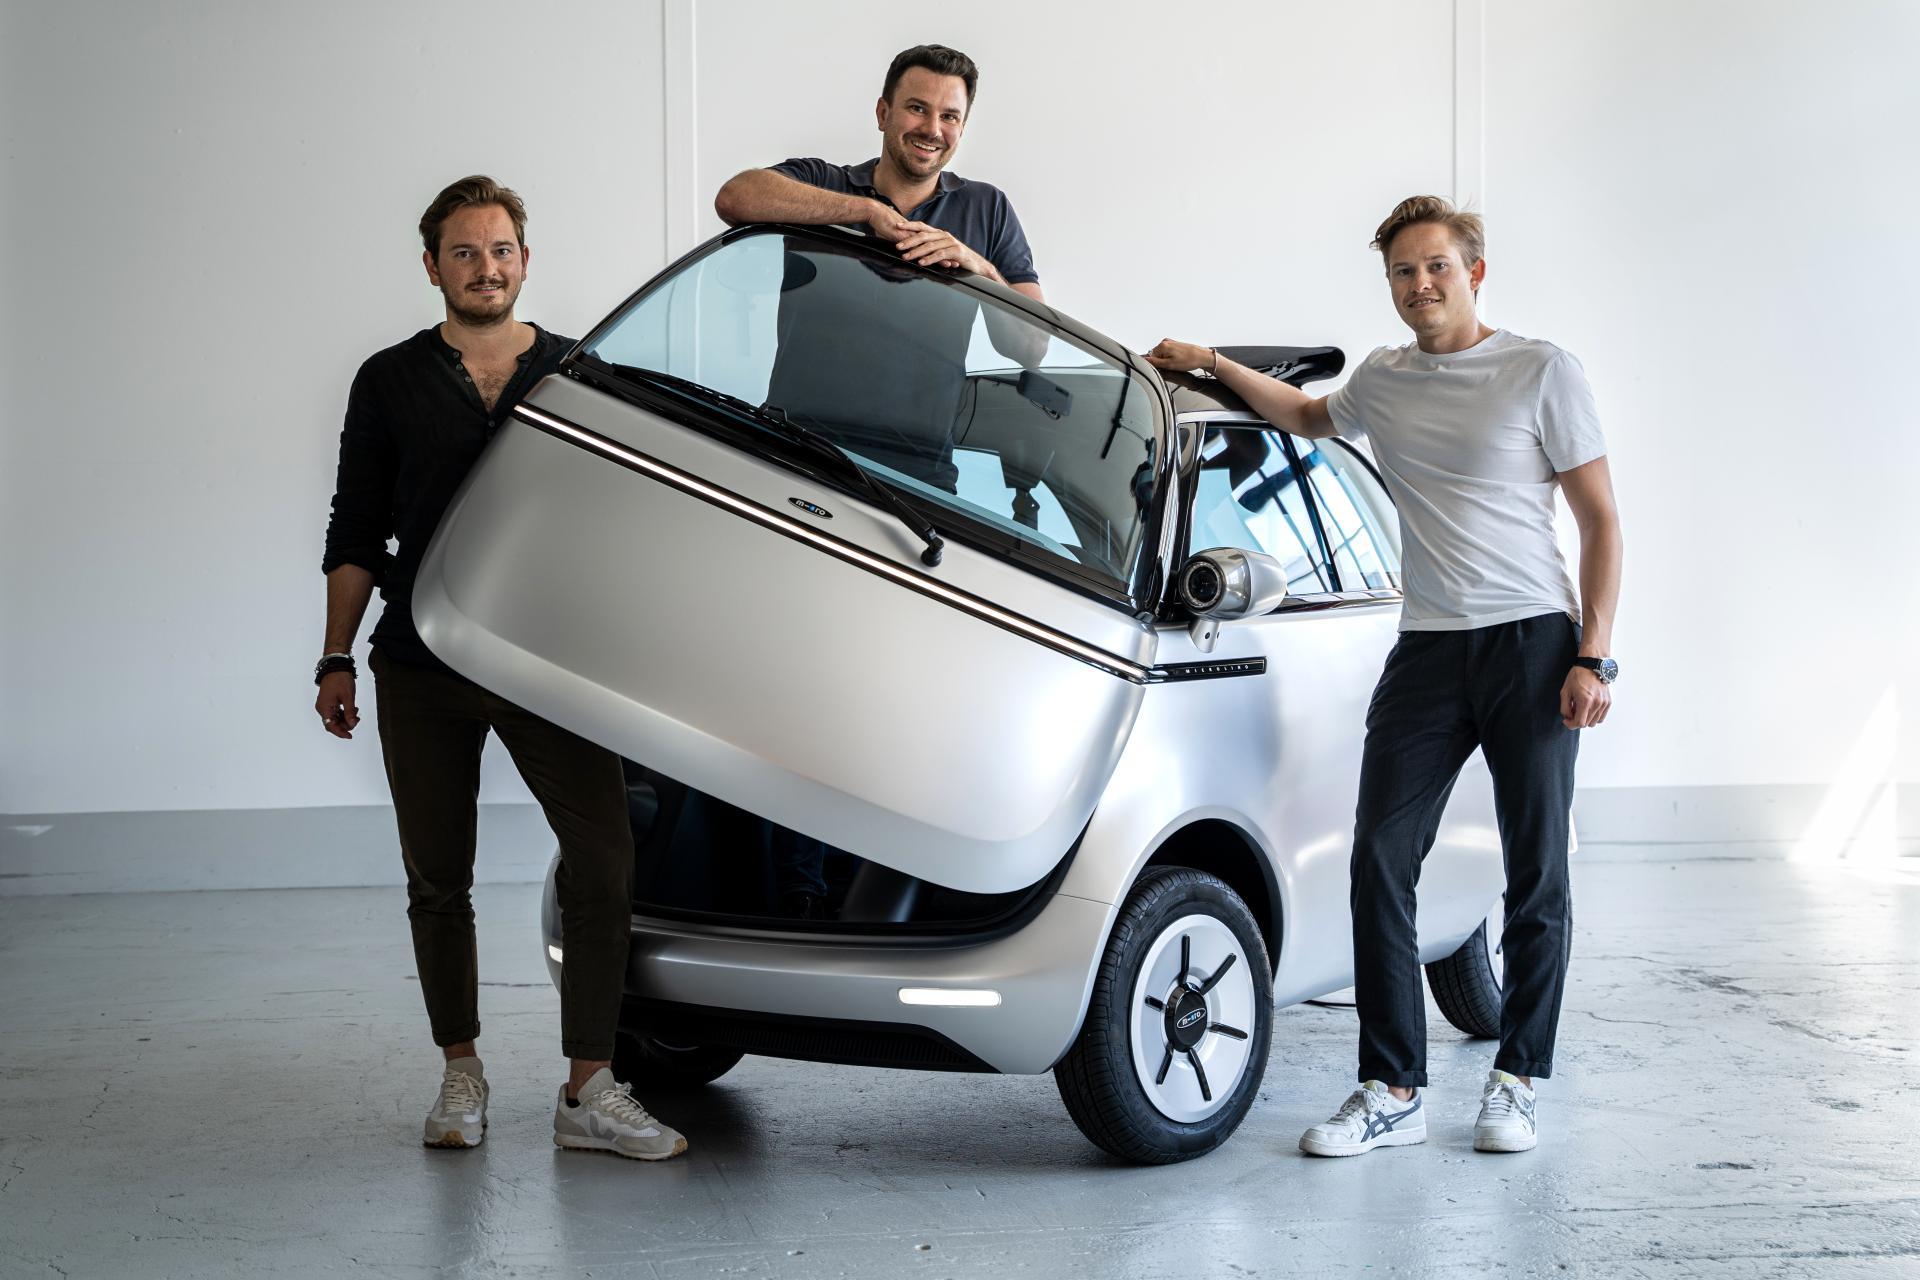 Jochen Rudat: Von Tesla zu Automobili Pininfarina zu Microlino